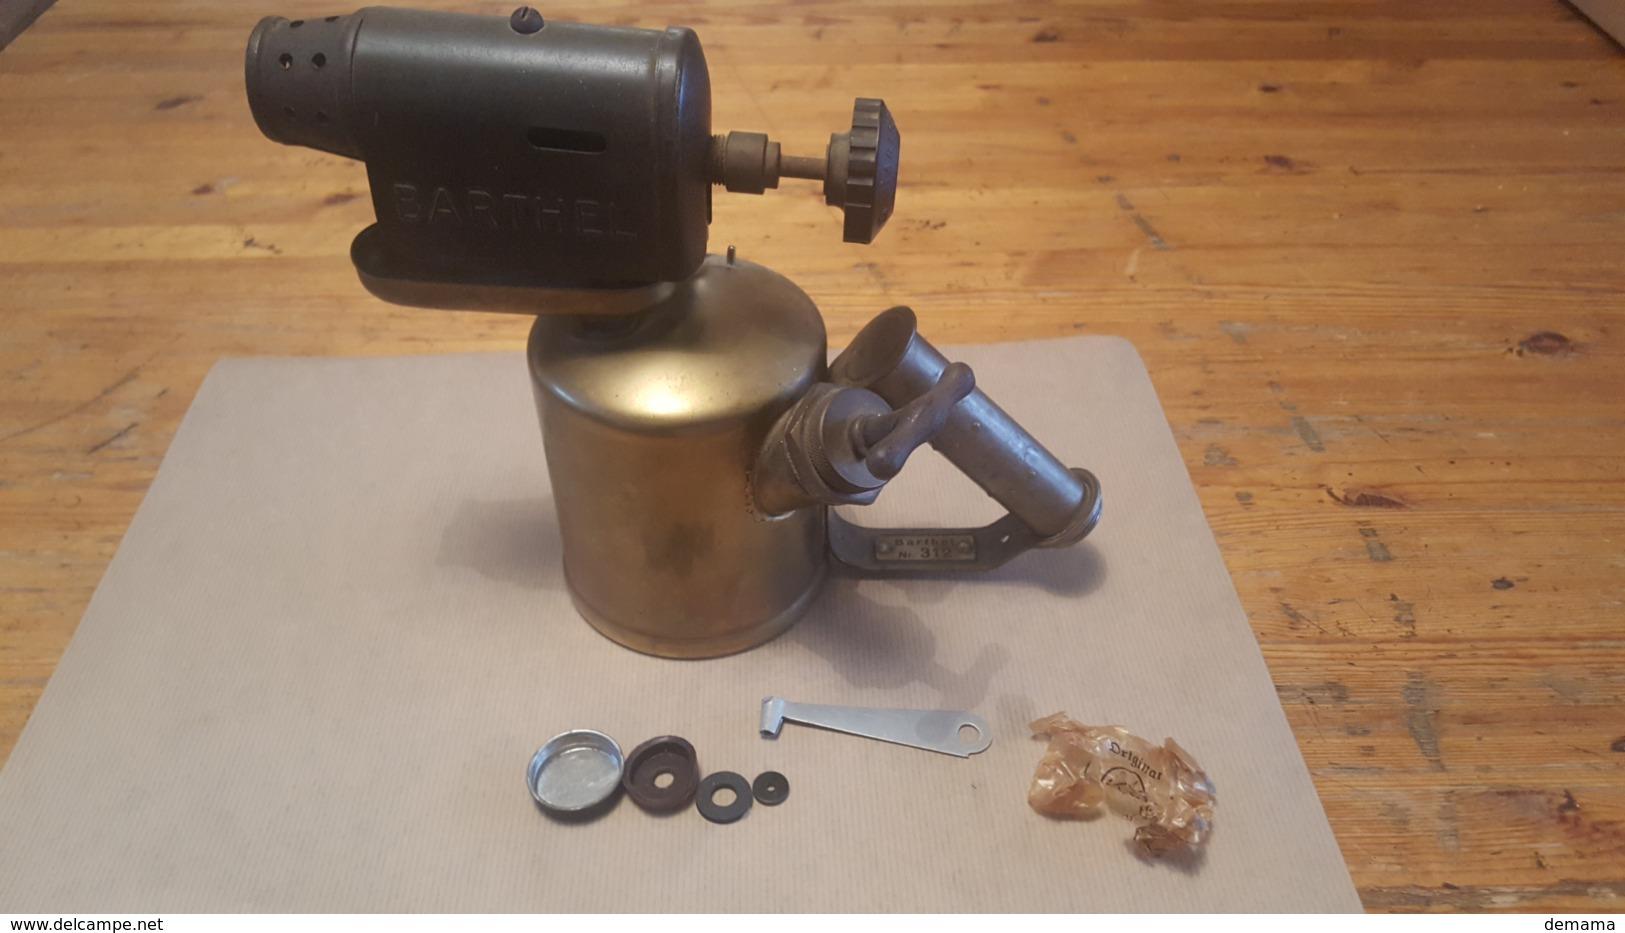 Soldeerlamp Barthel 312, Zeldzaam Model - Outils